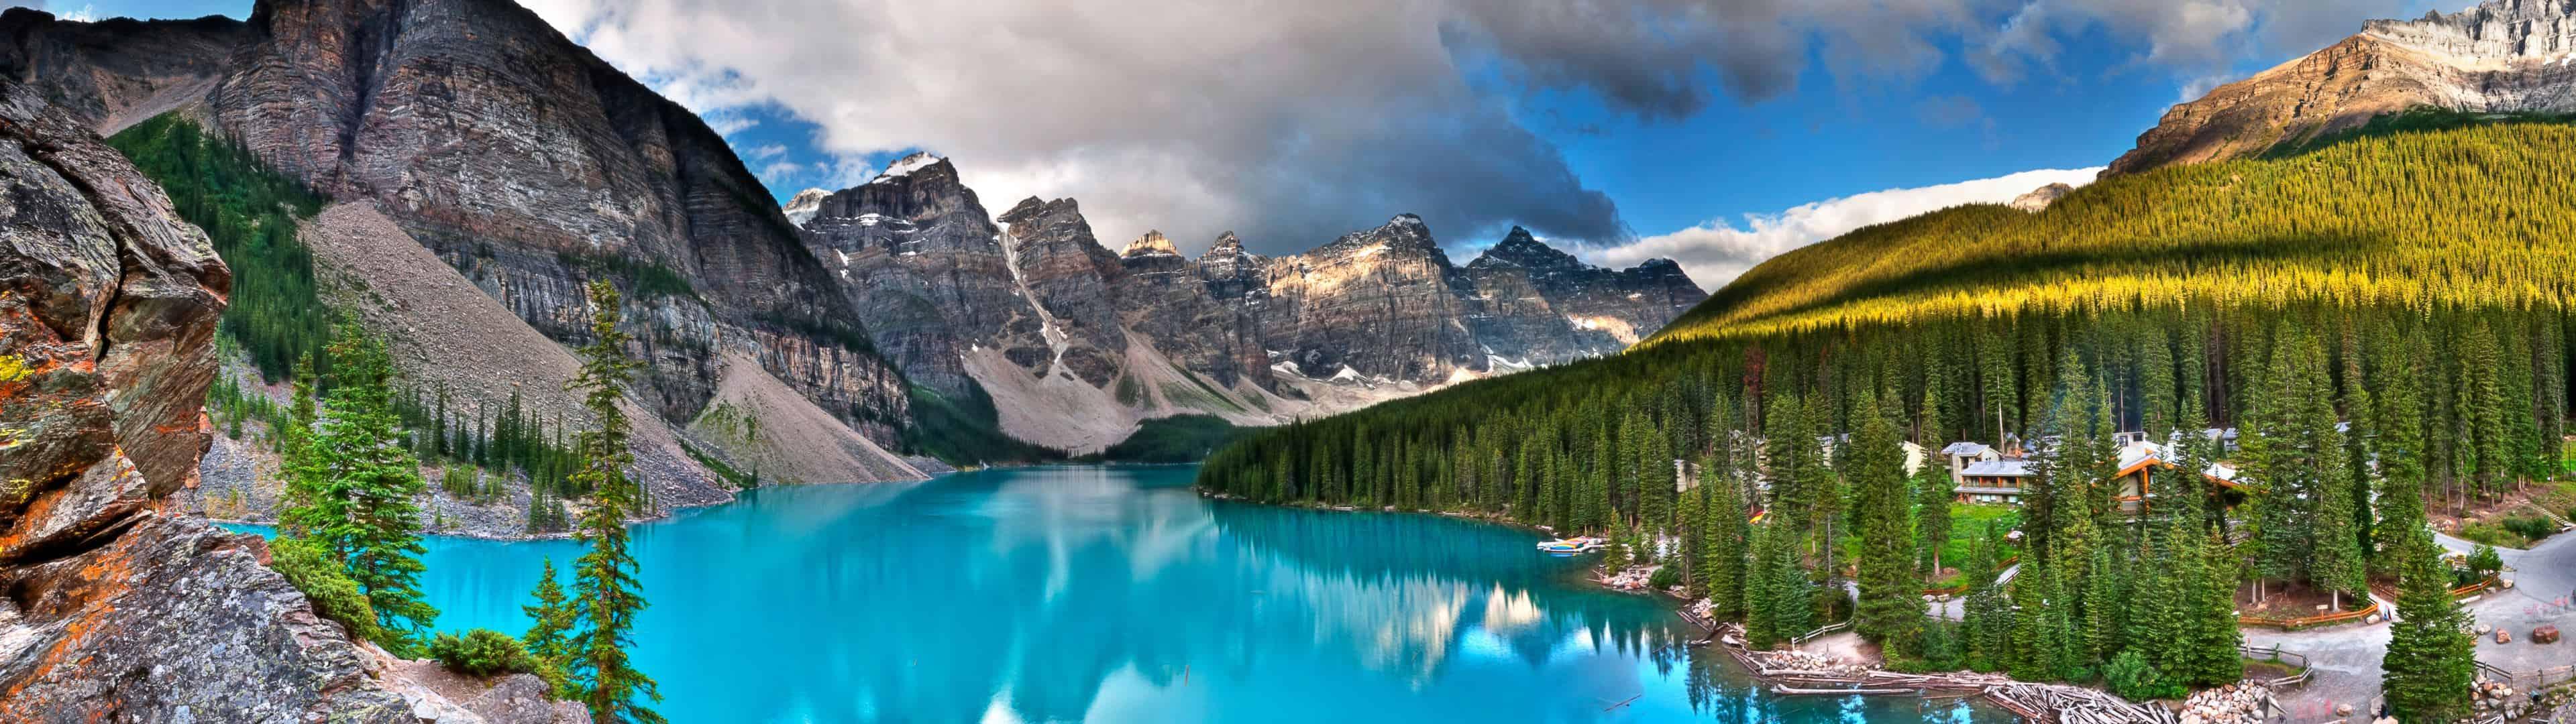 Moraine Lake Banff National Park Canada Dual Monitor